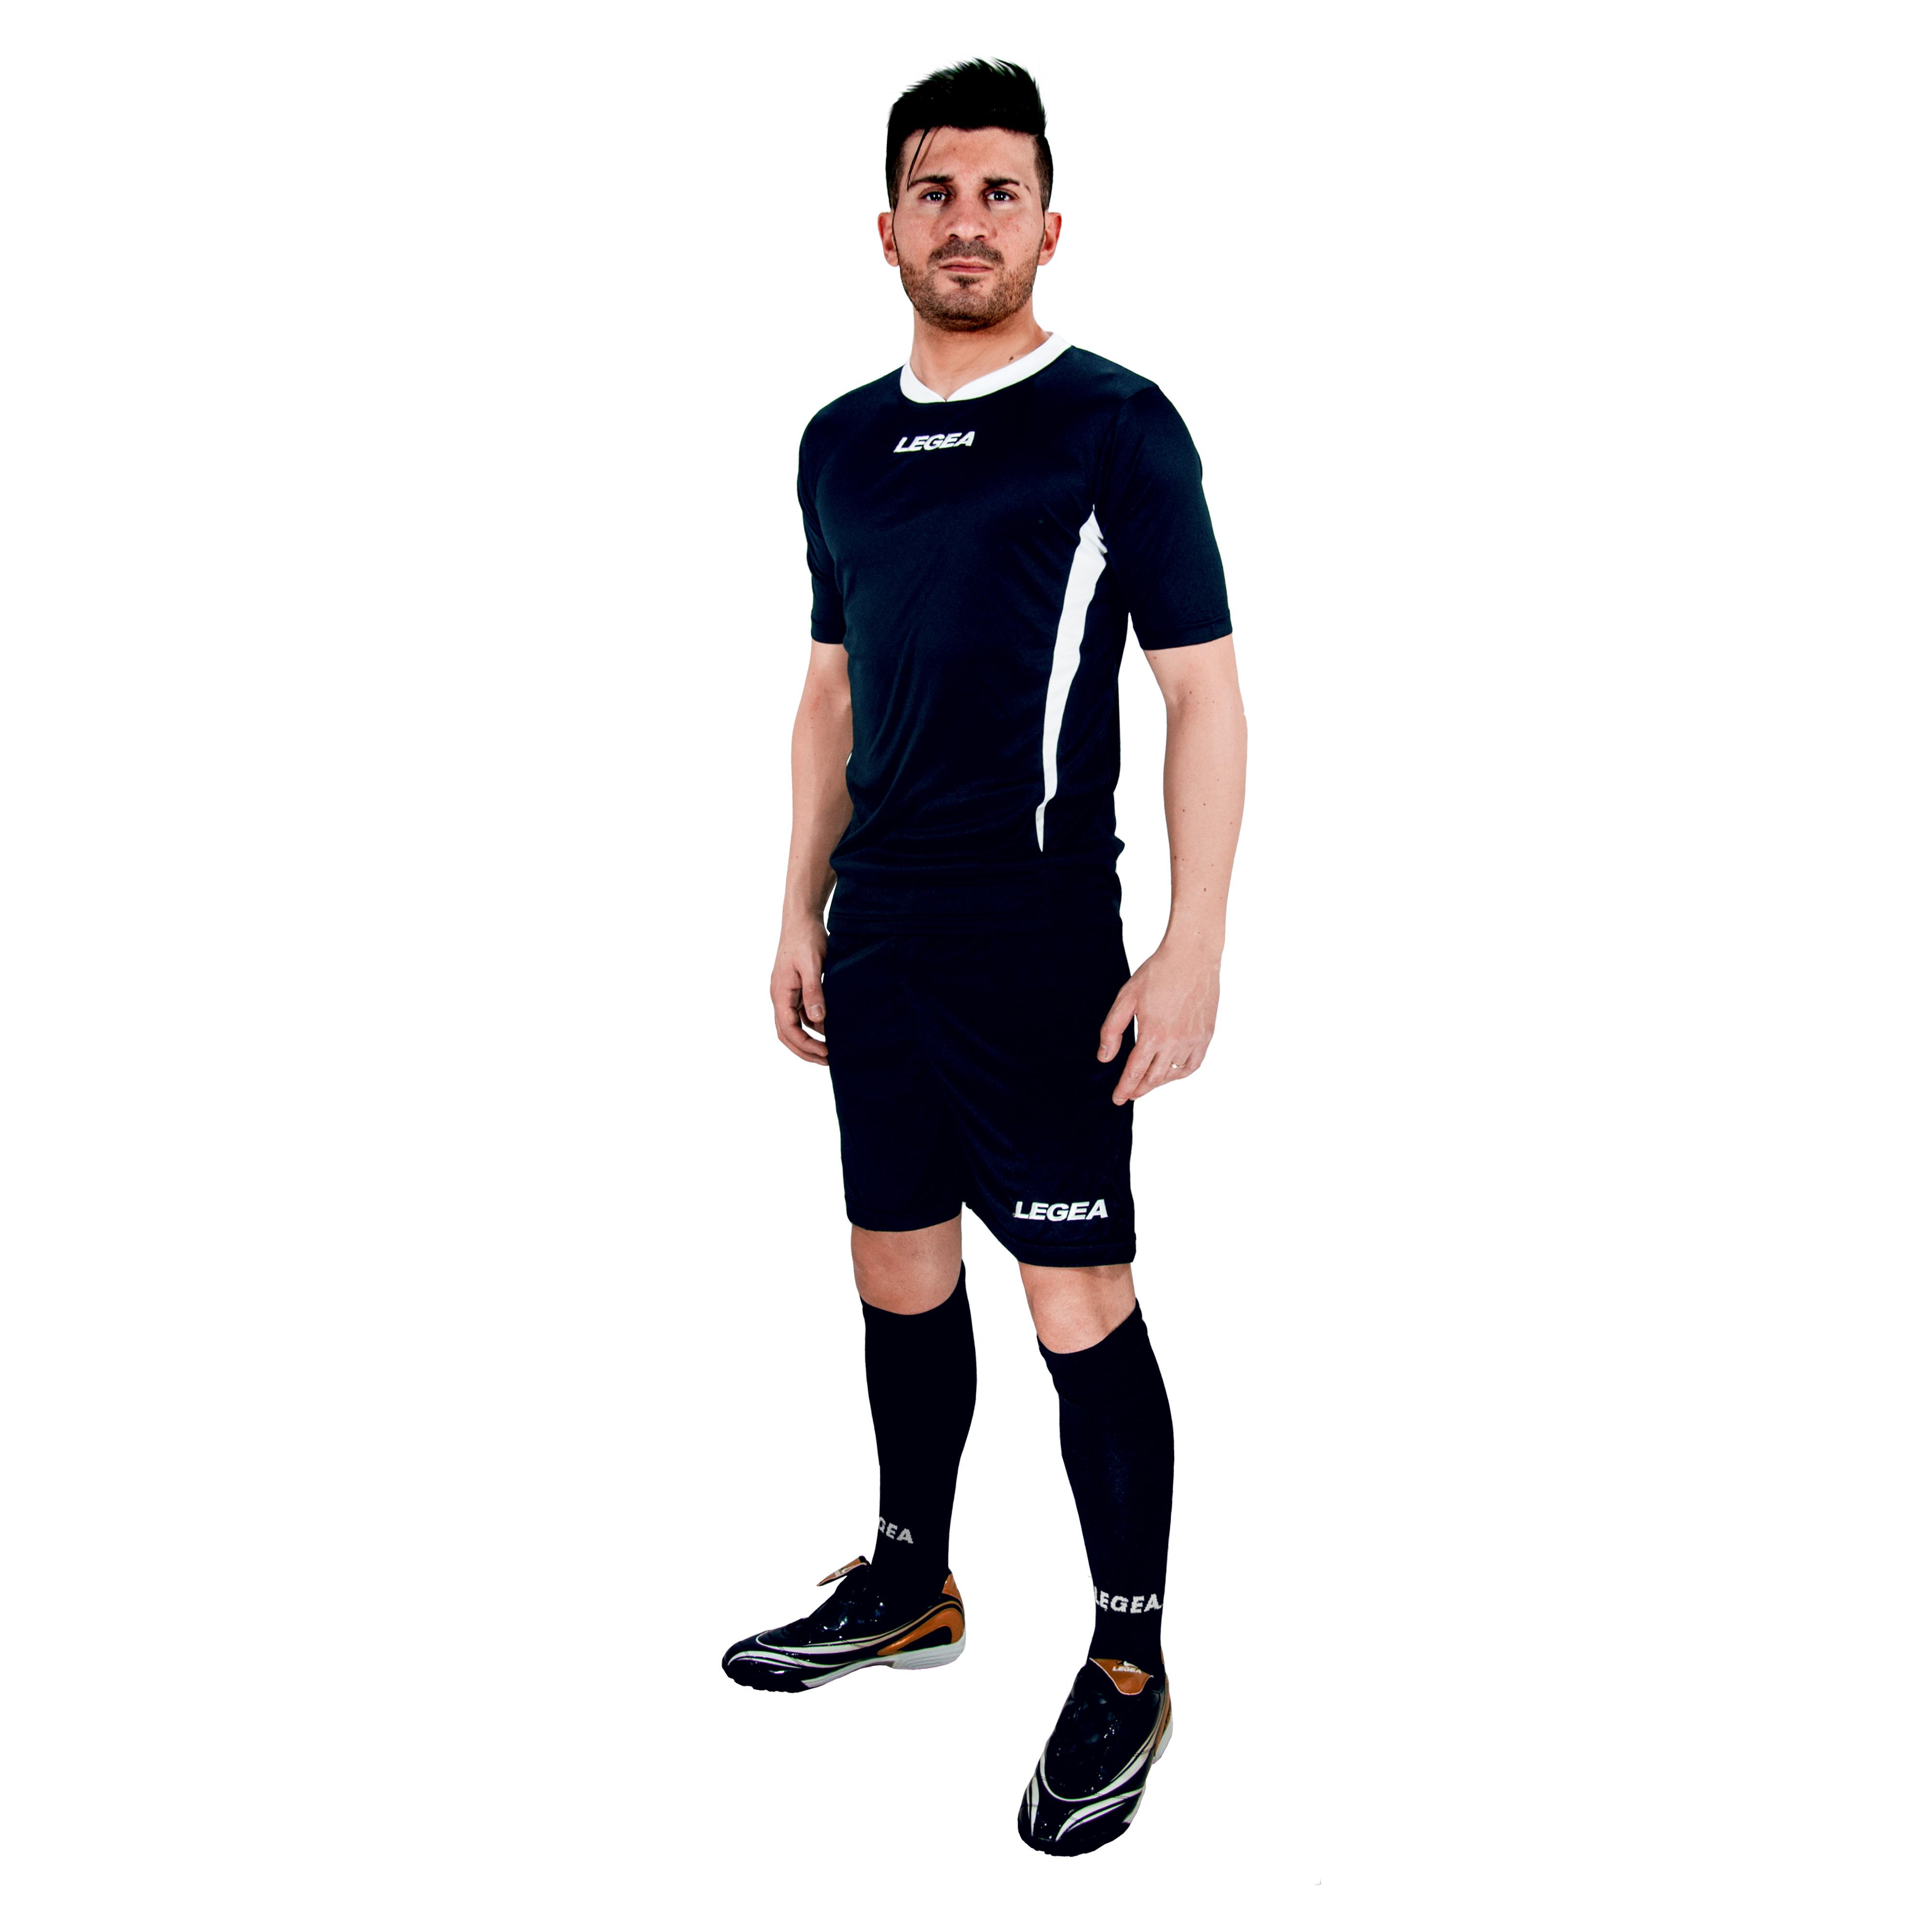 fe74557f0 Спортивная одежда Legea, Спортивная одежда Legea купить, Спортивная одежда  Legea цена, Спортивная одежда